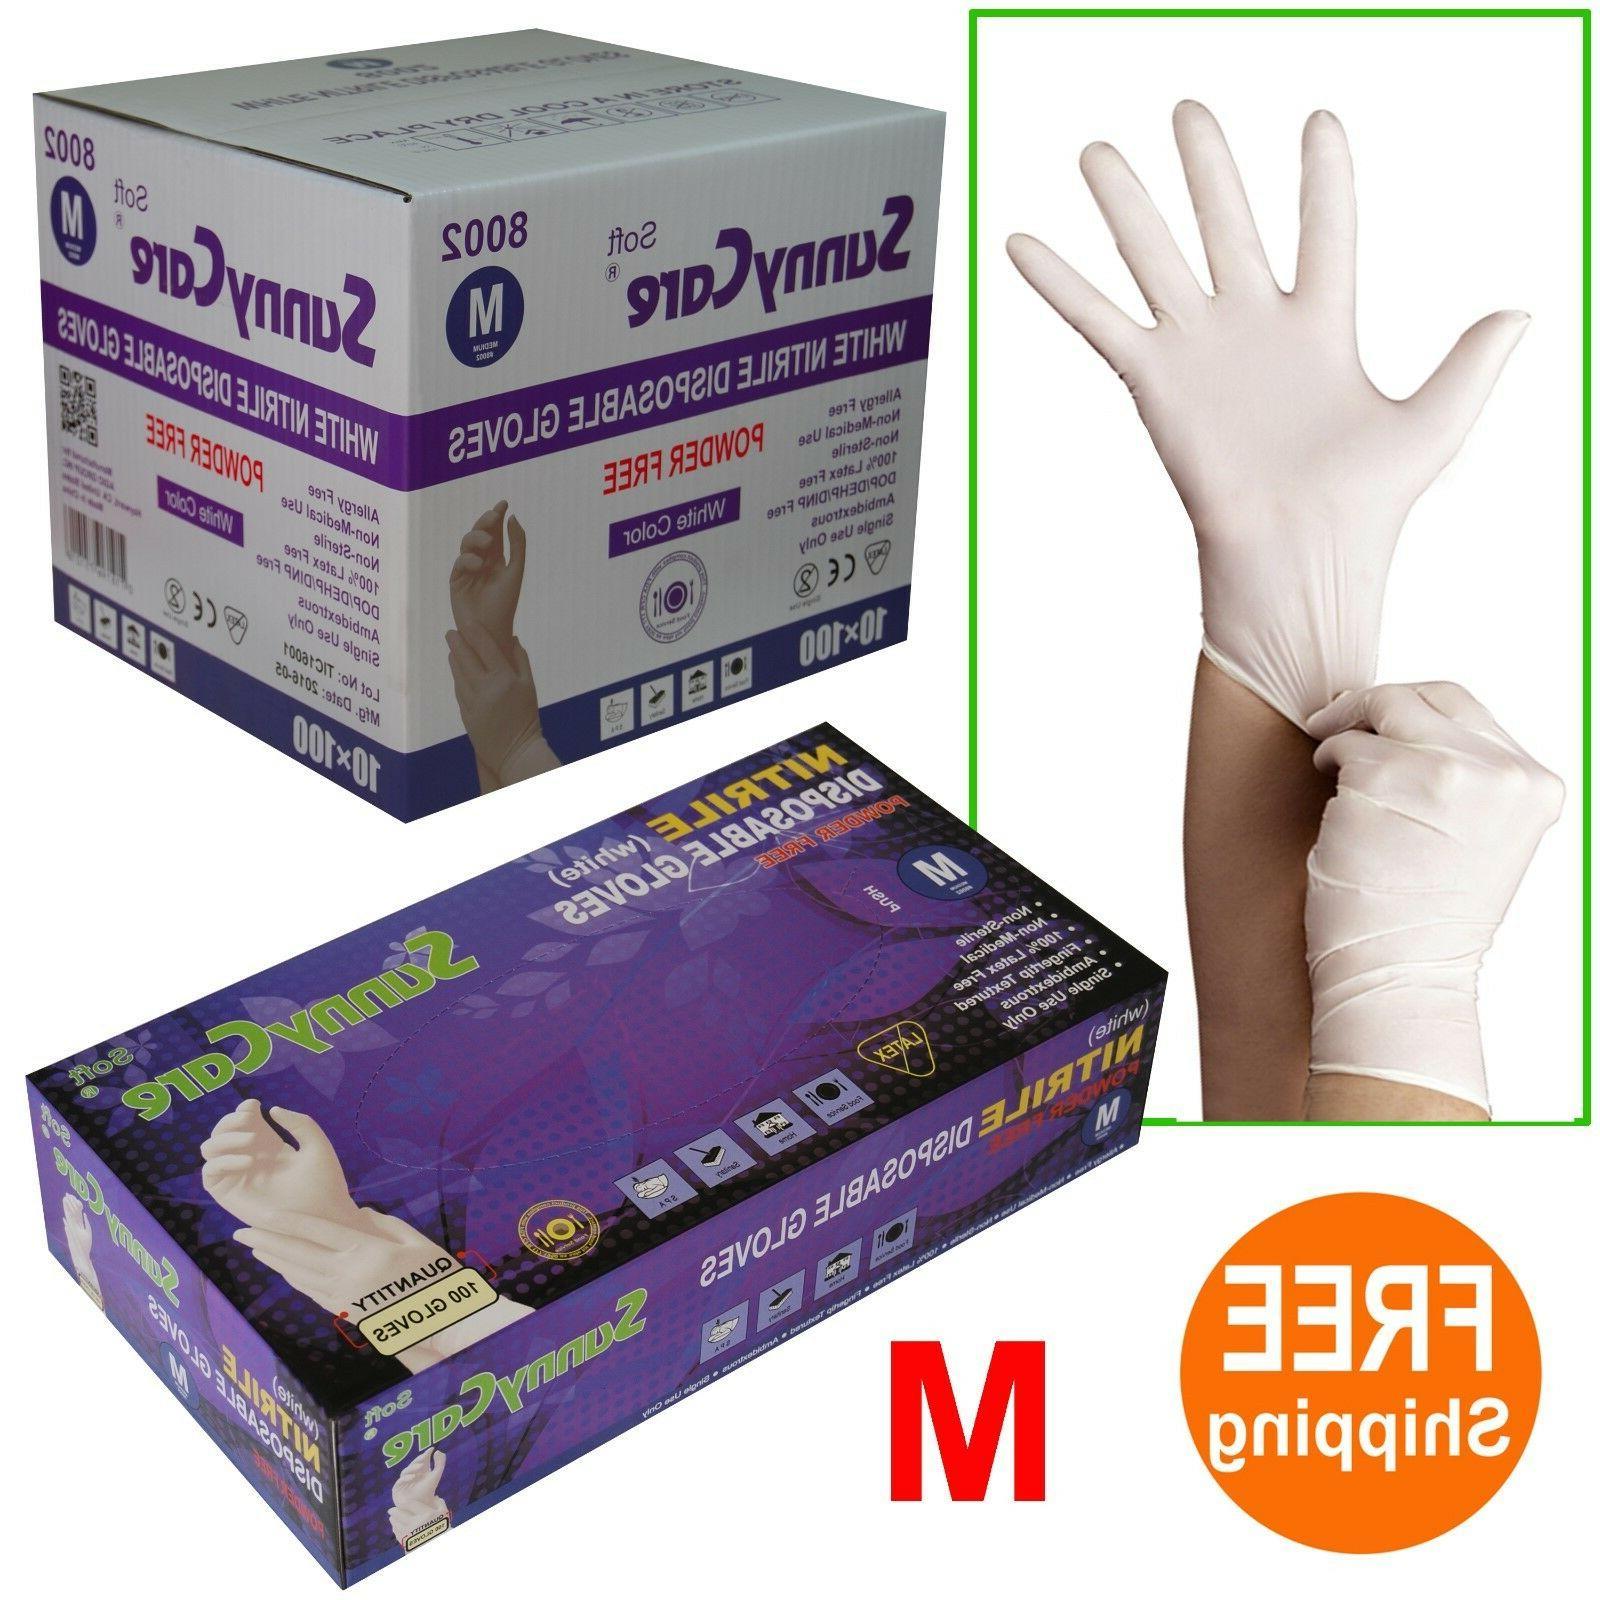 sunnycare 8002 white nitrile disposable gloves powder